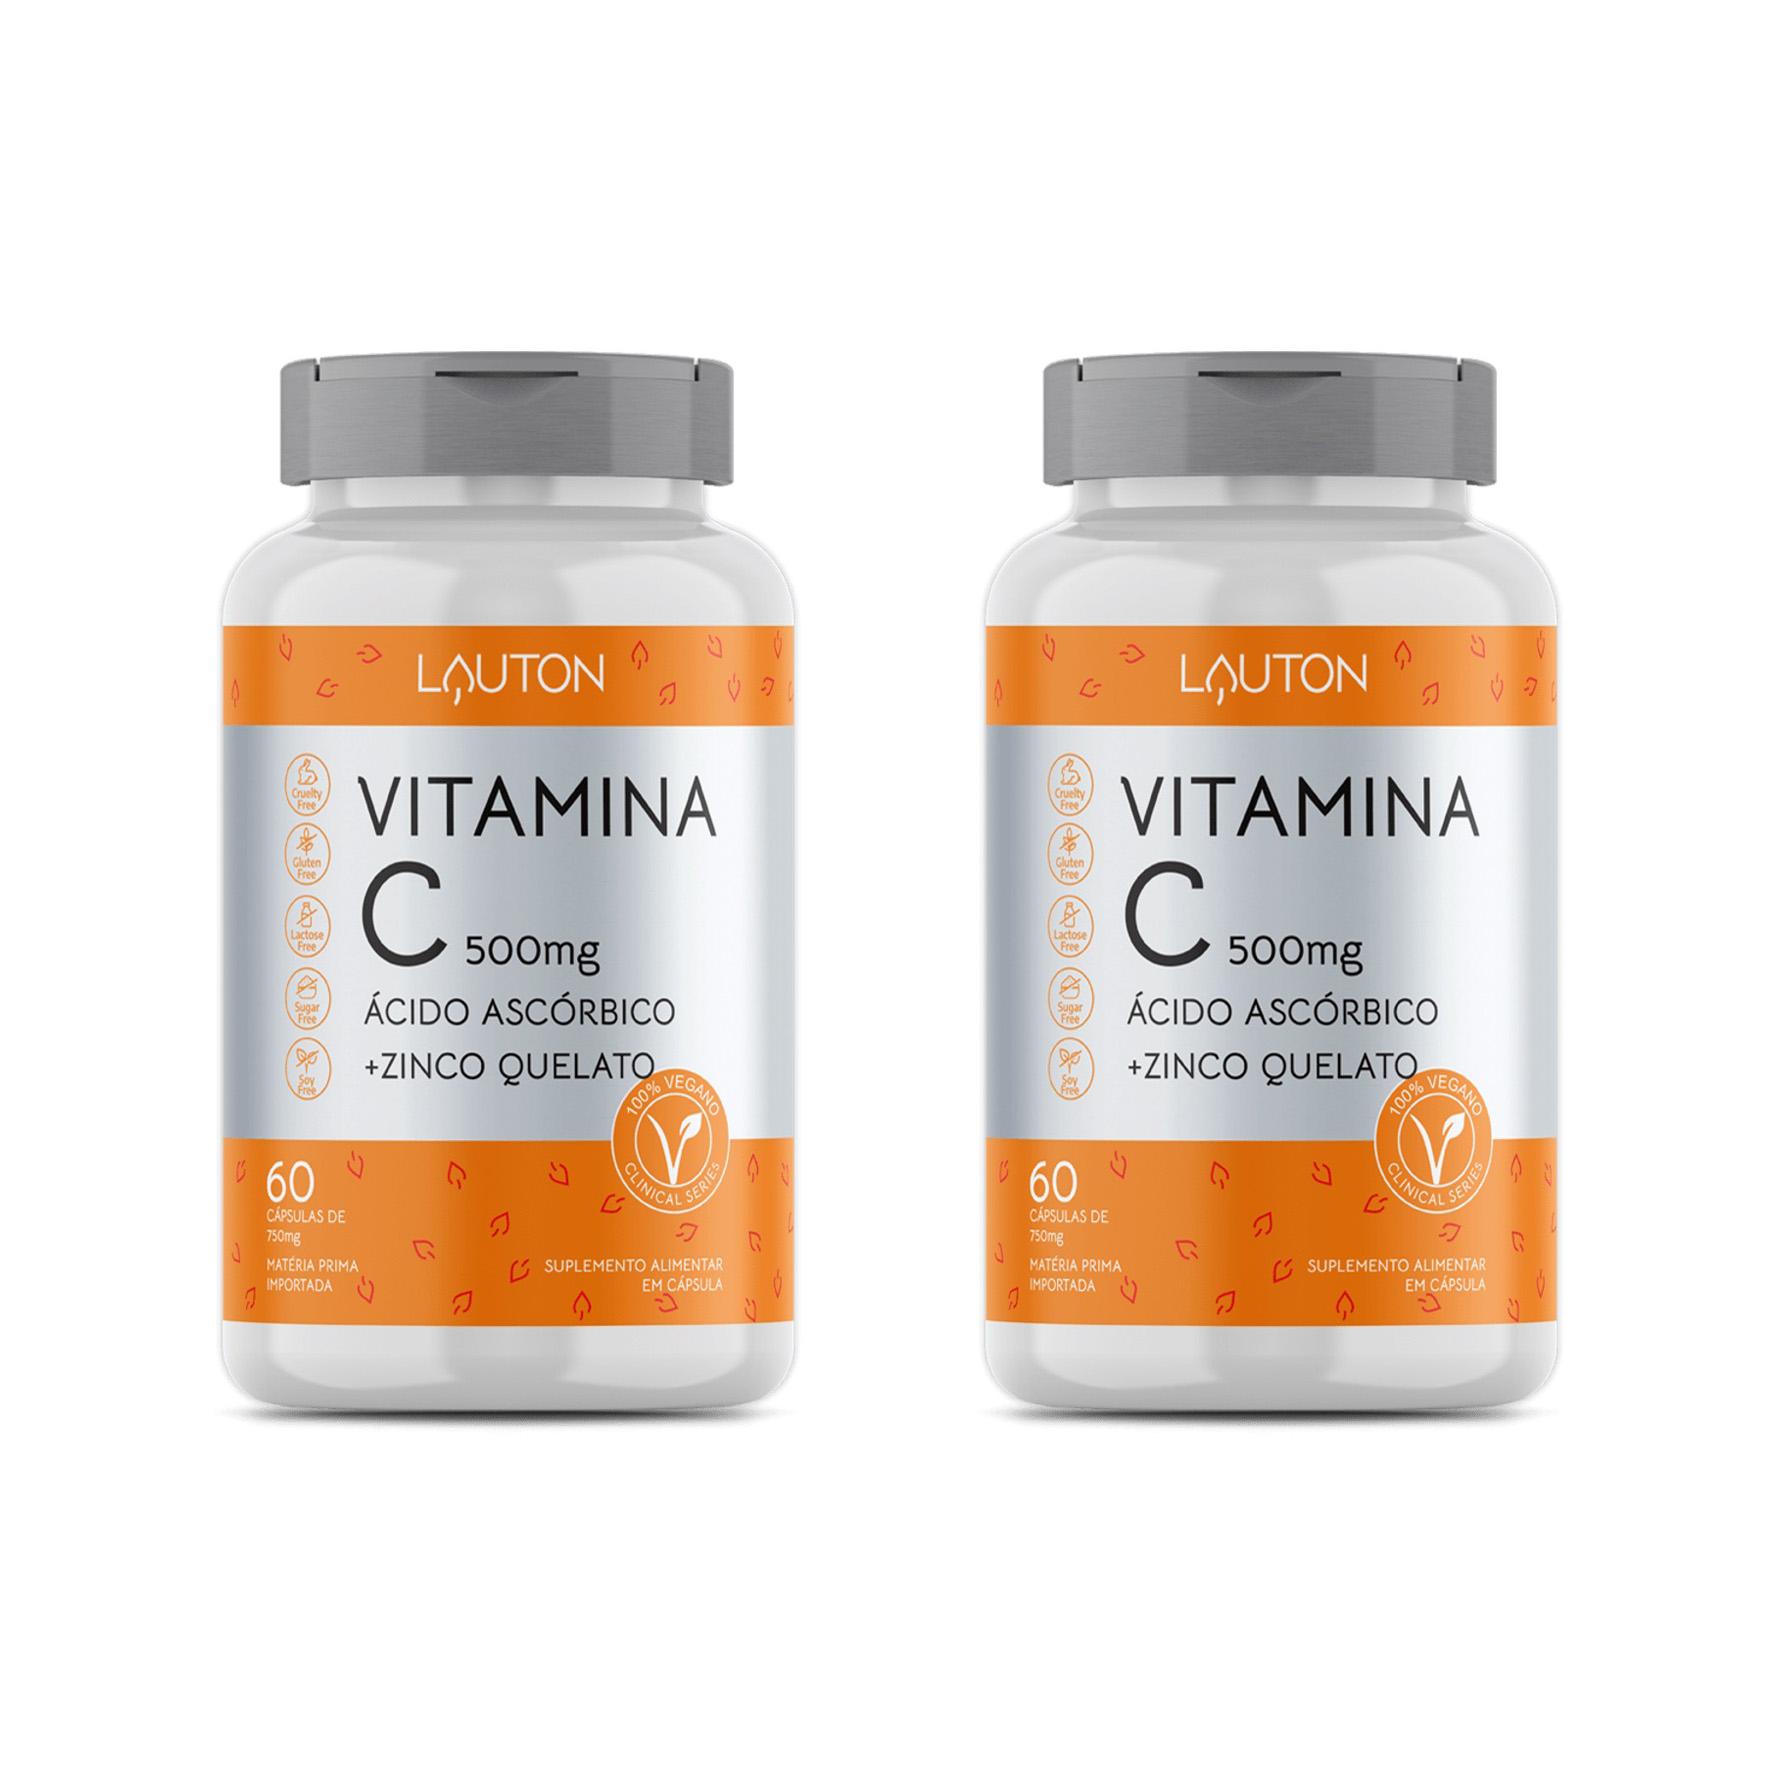 Vitamina C + Zinco 500mg - 60 Cápsulas- Lauton Nutrition (2 Unidades)